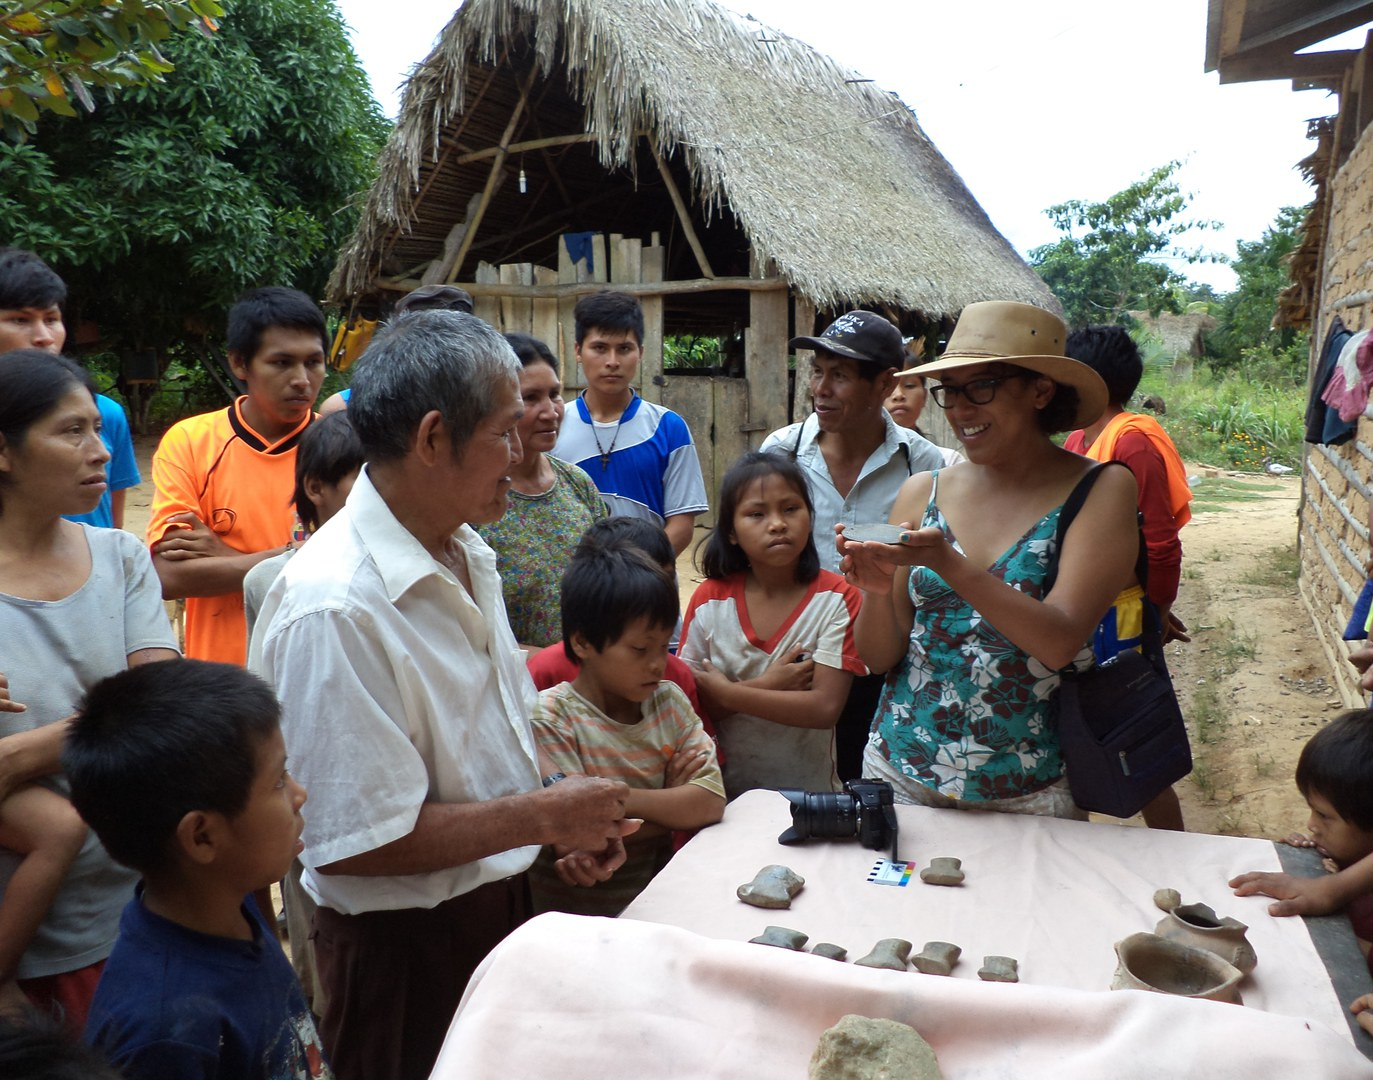 The Tsimane community